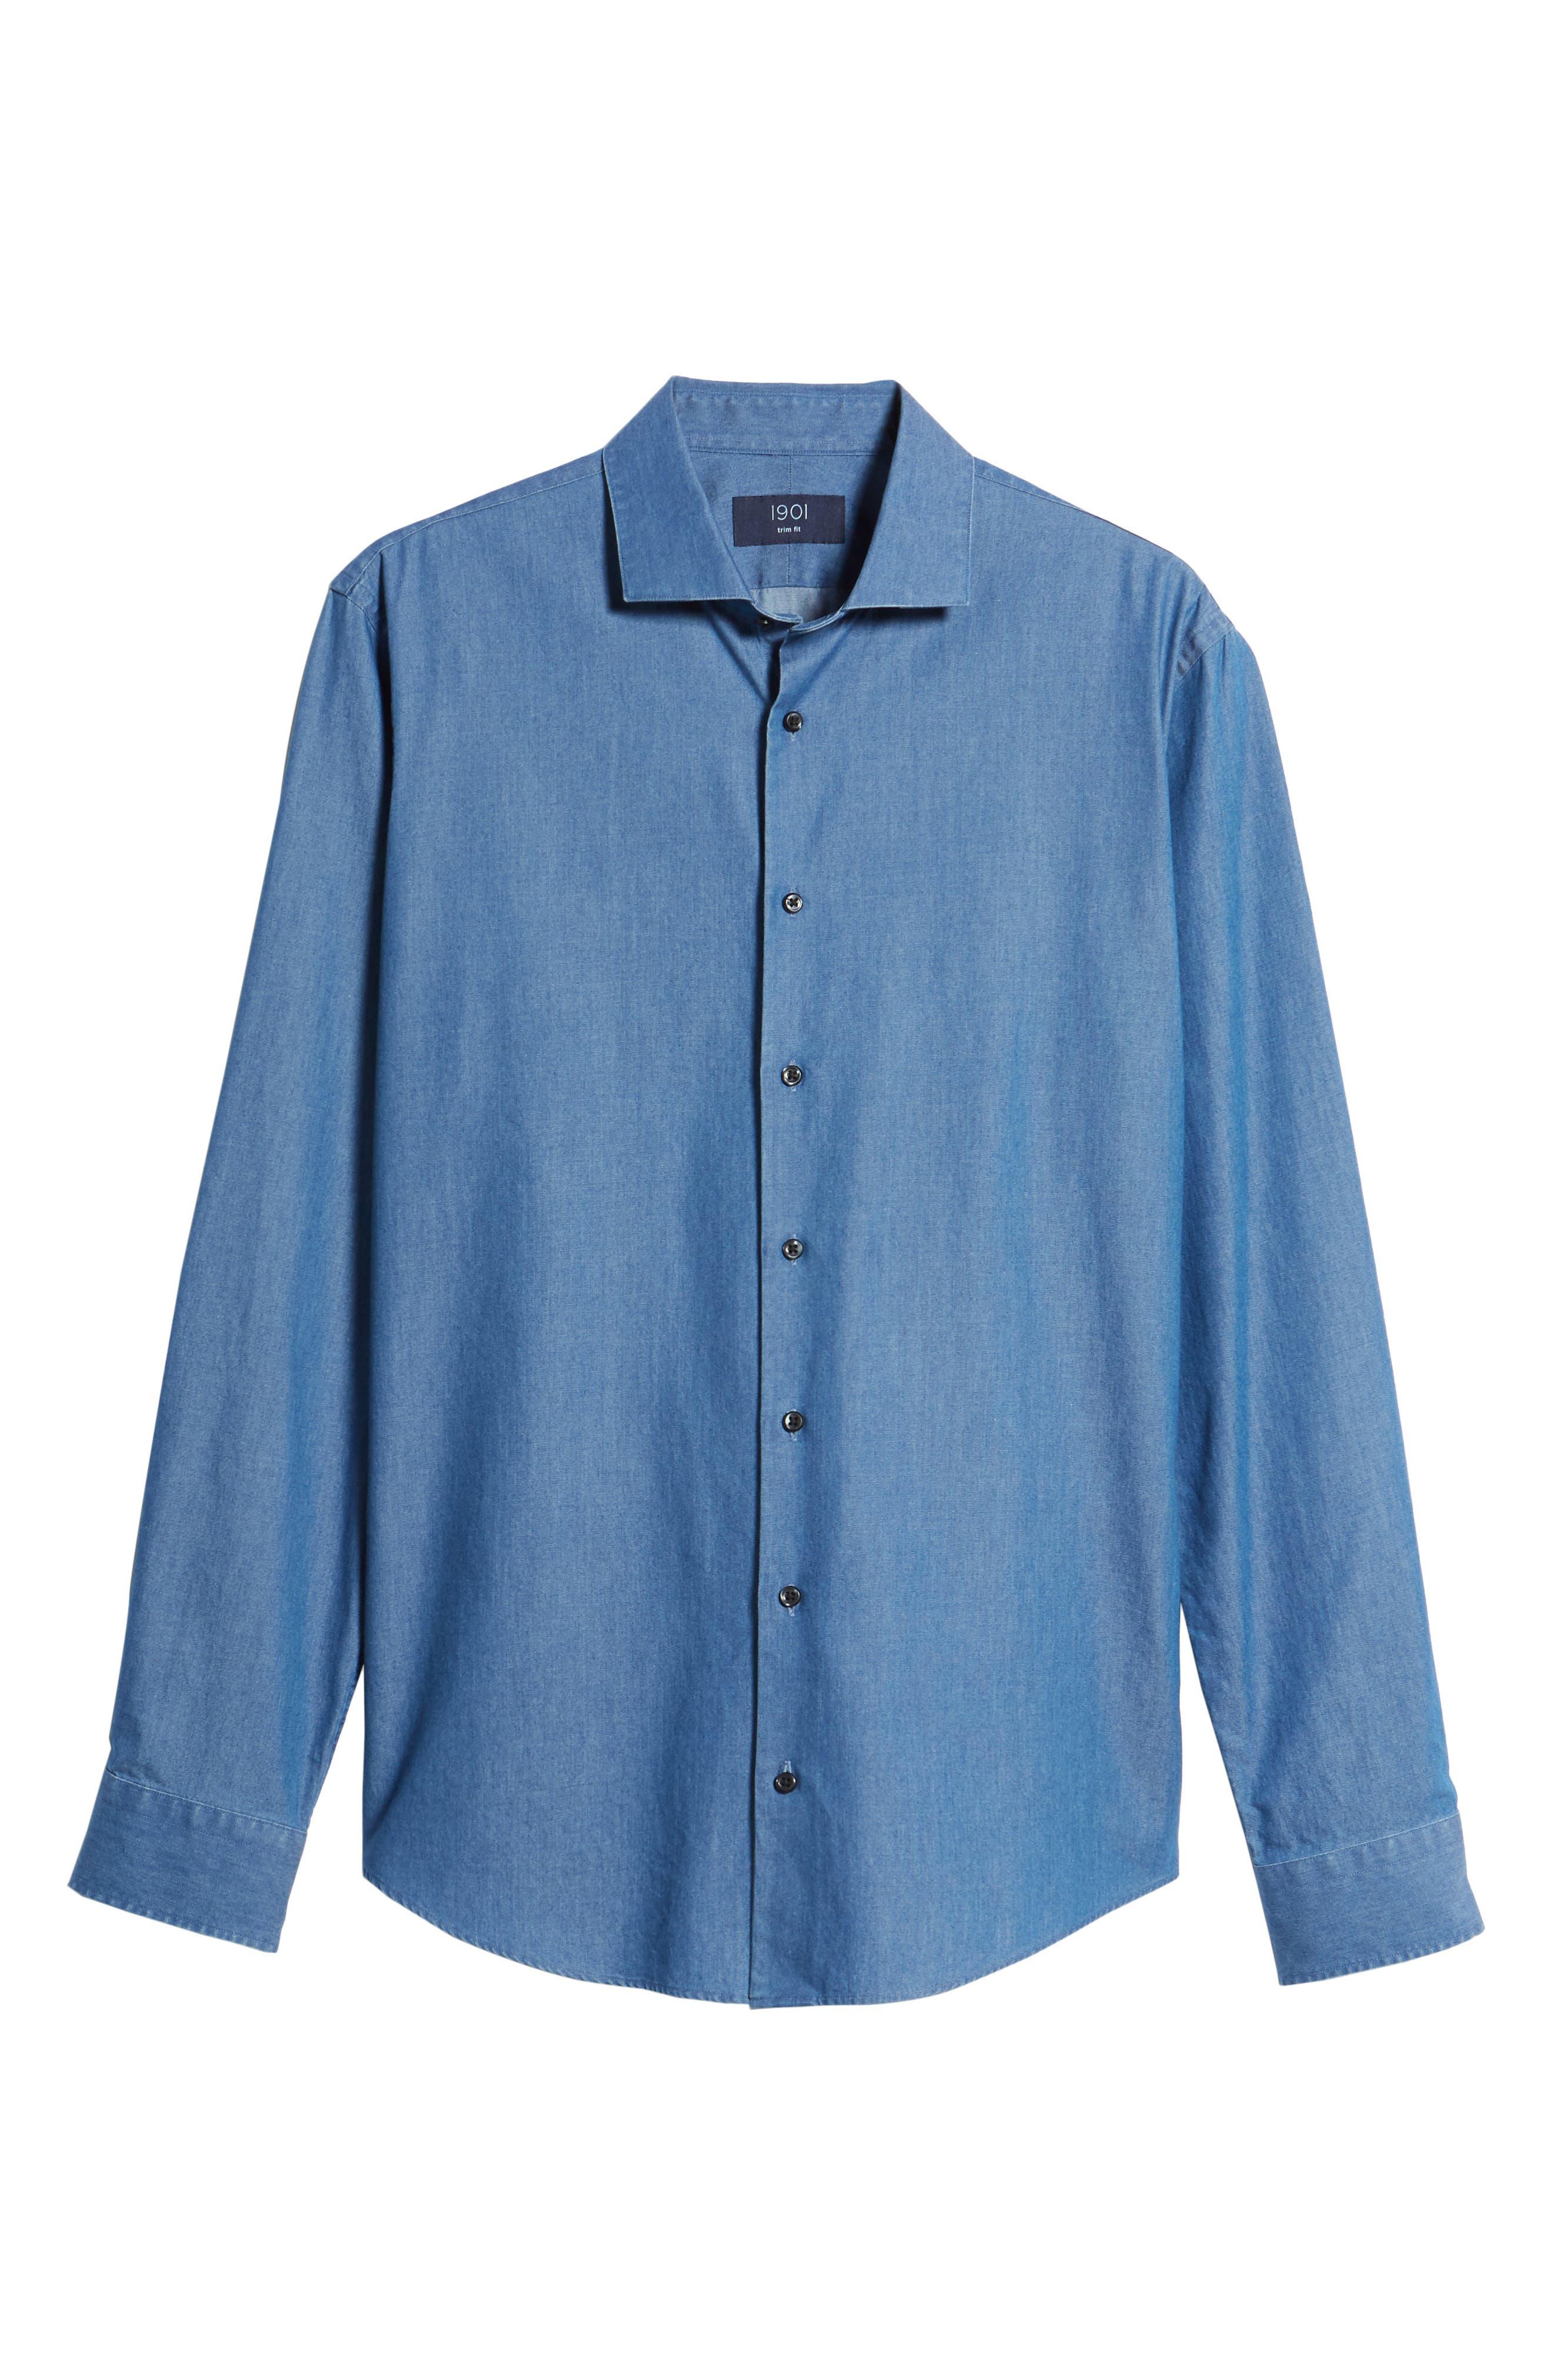 Trim Fit Solid Denim Dress Shirt,                             Alternate thumbnail 5, color,                             BLUE DENIM